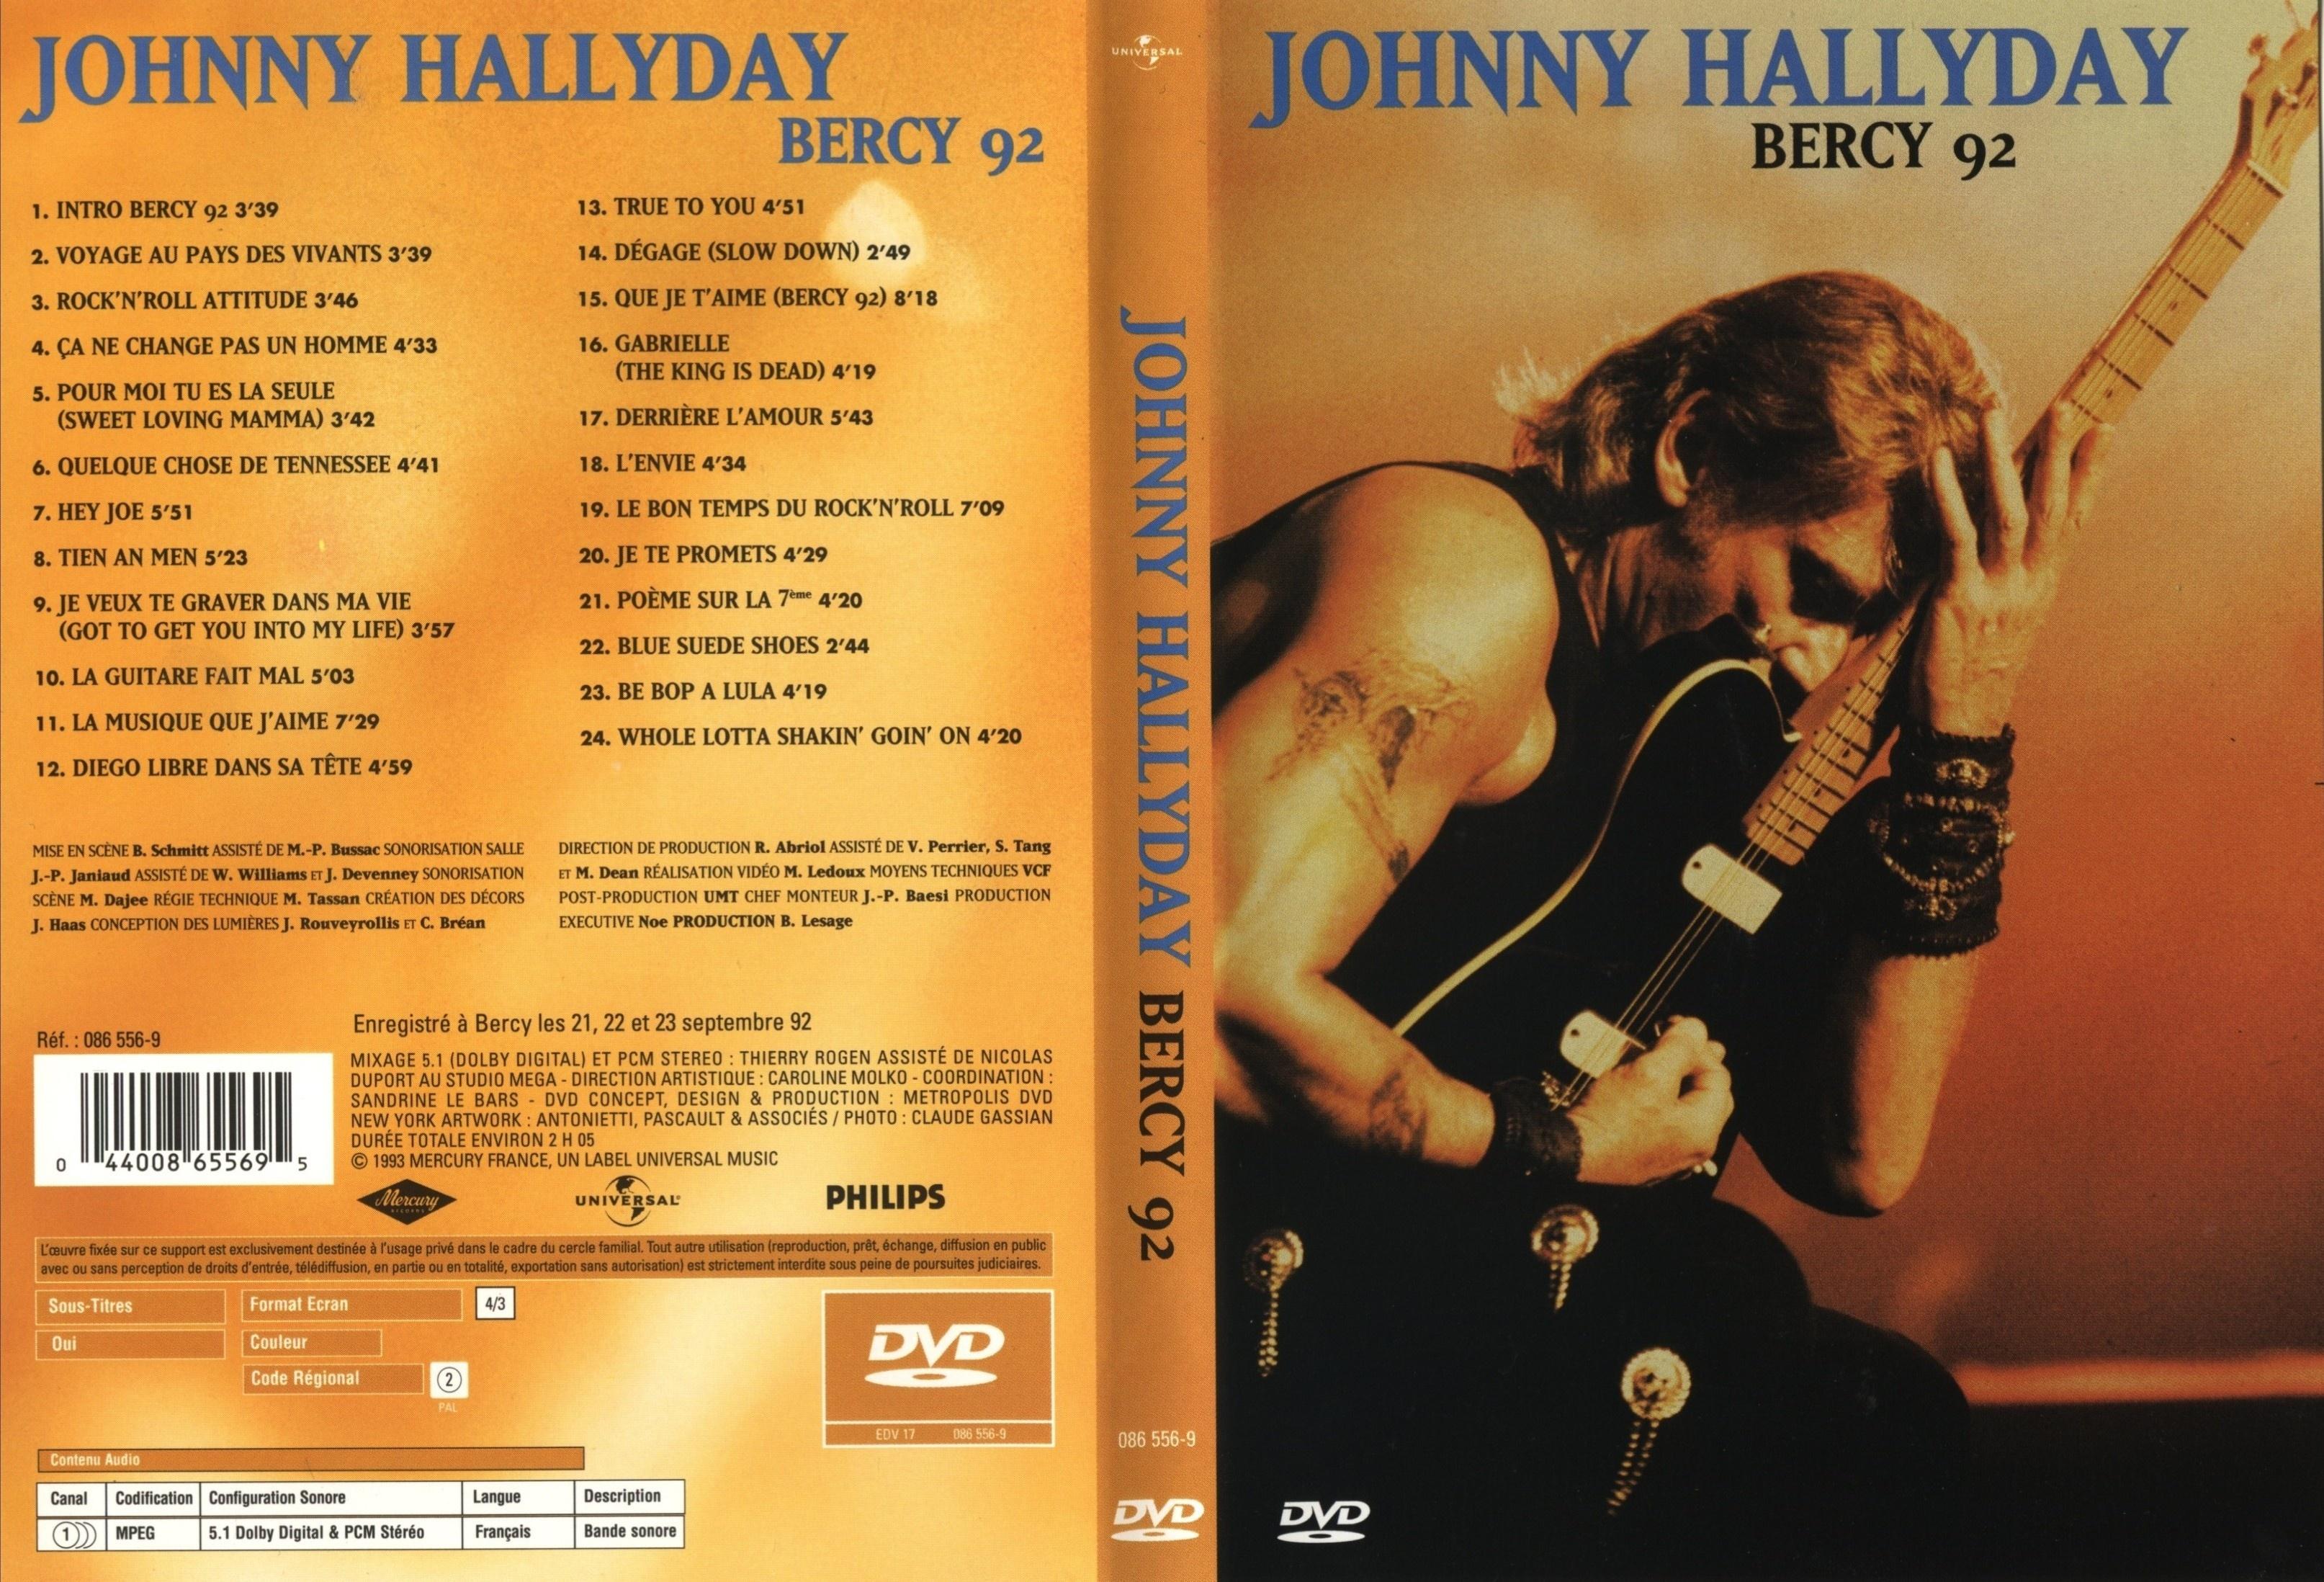 DVDJohnny_Hallyday_Bercy_1992.jpg